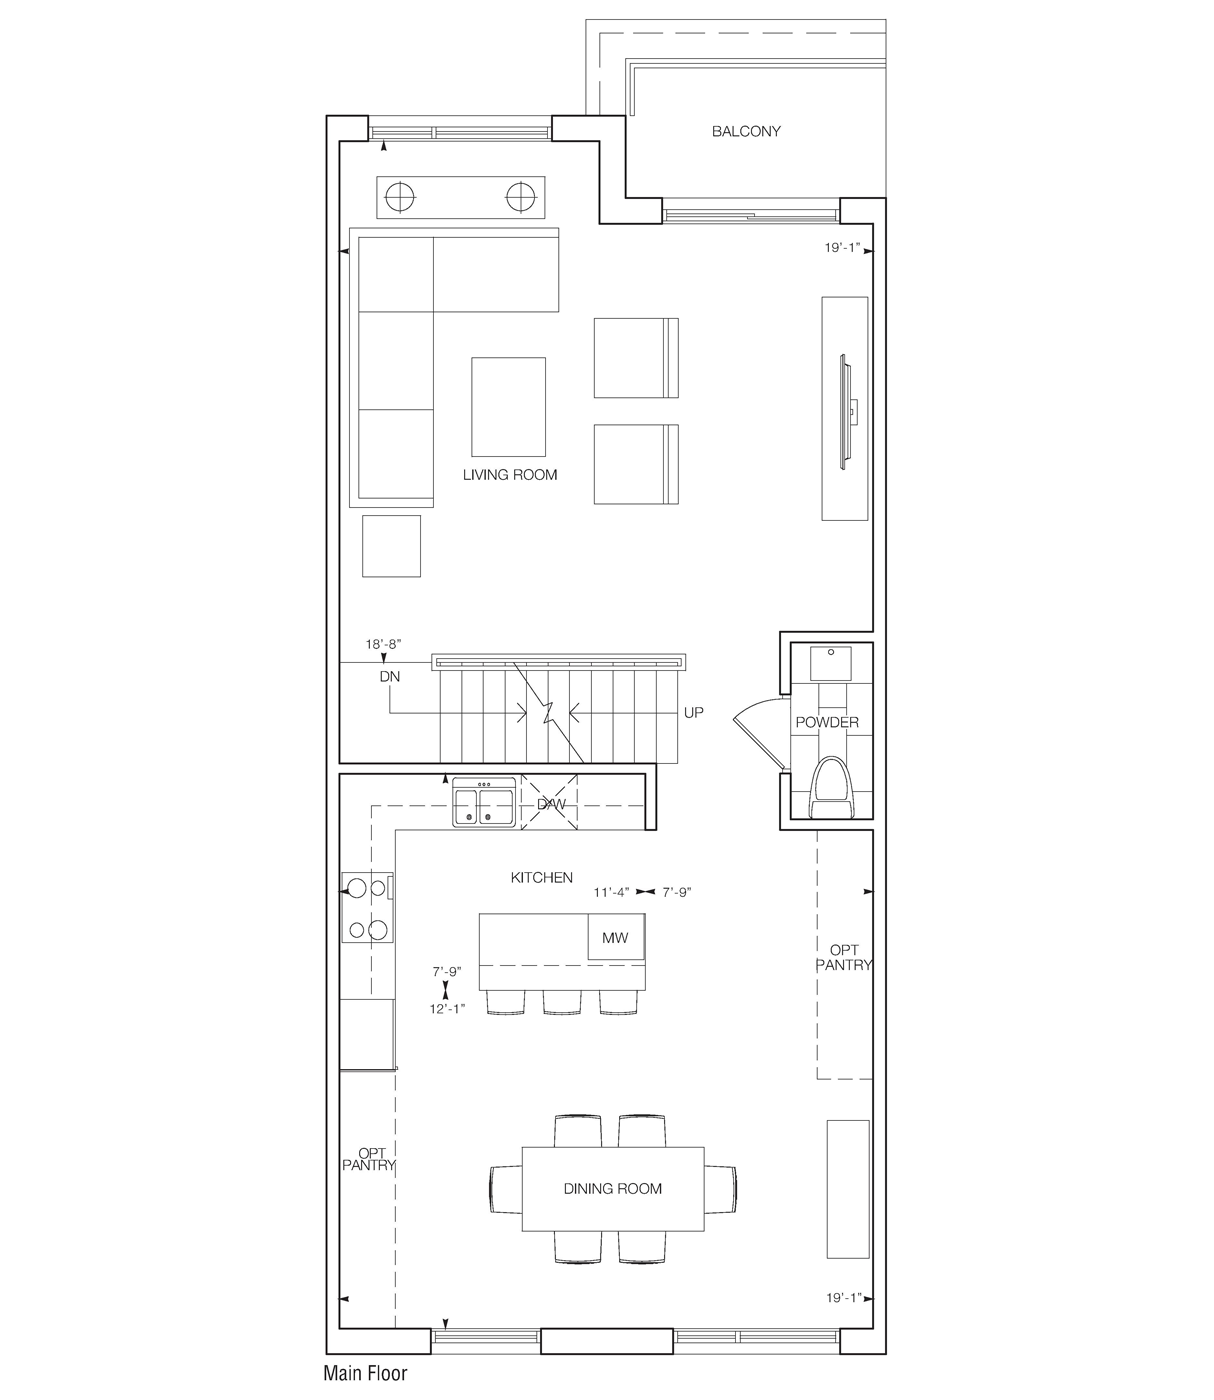 Living Room & Dining Room Flooplan